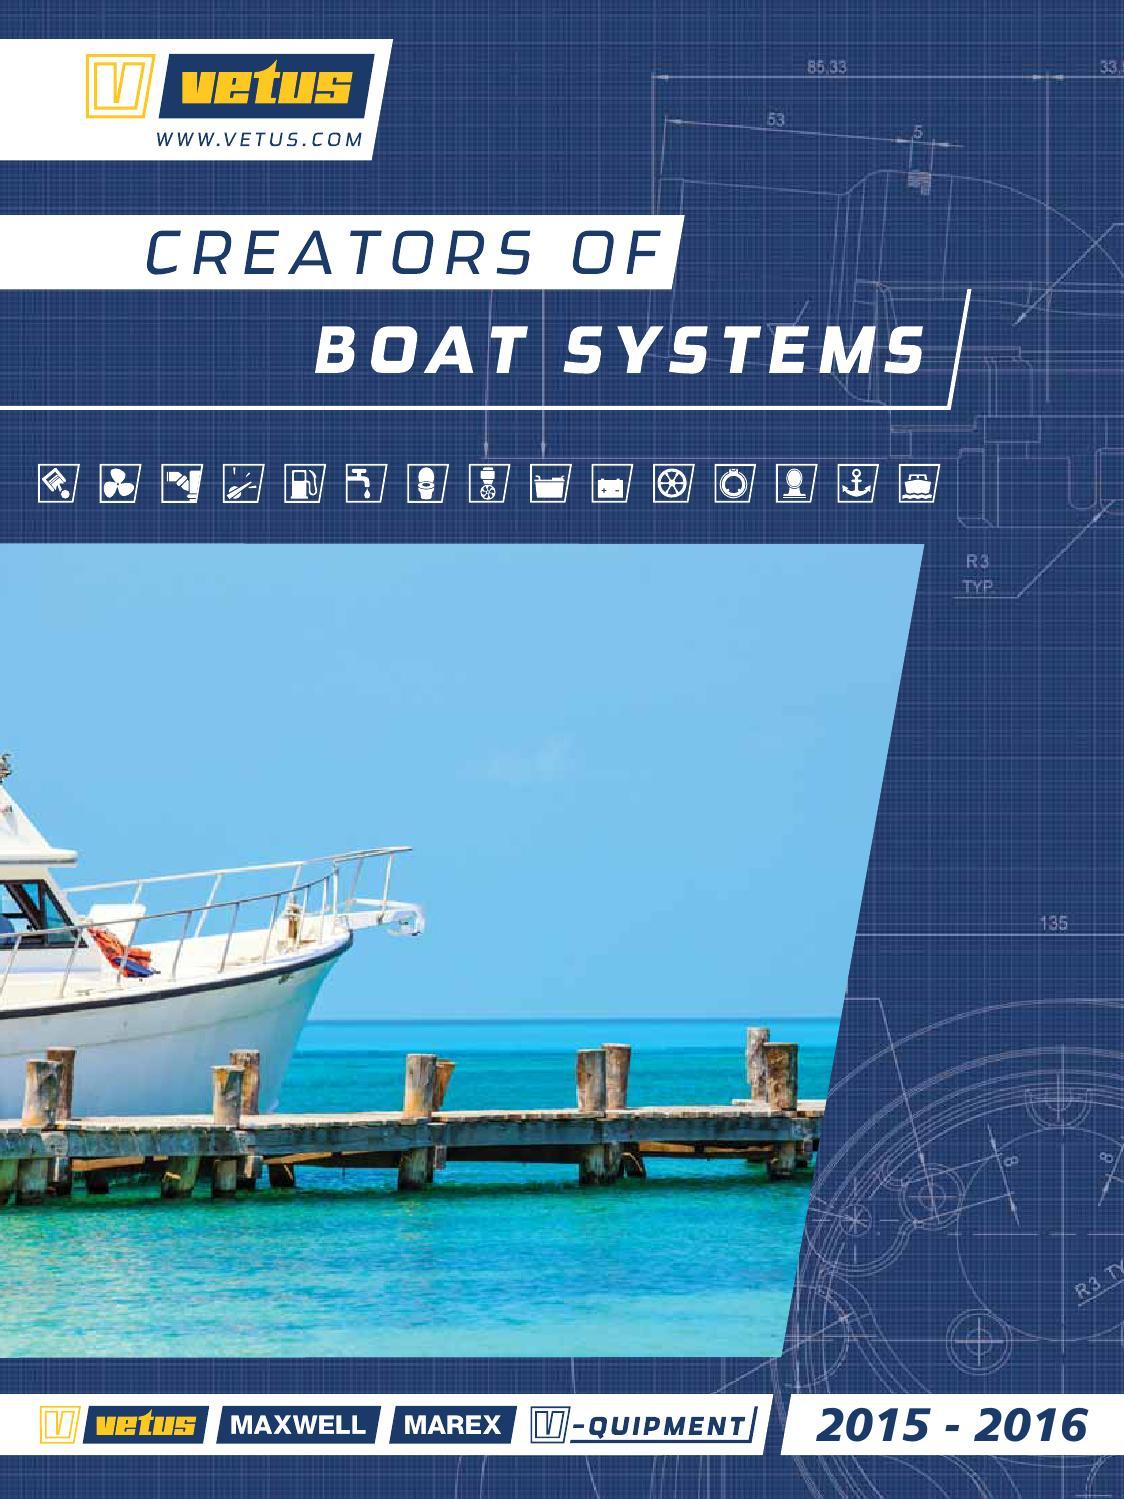 Vetus 1//2 Inch Stainless Steel Straight Marine Boat Thru Hull Connector